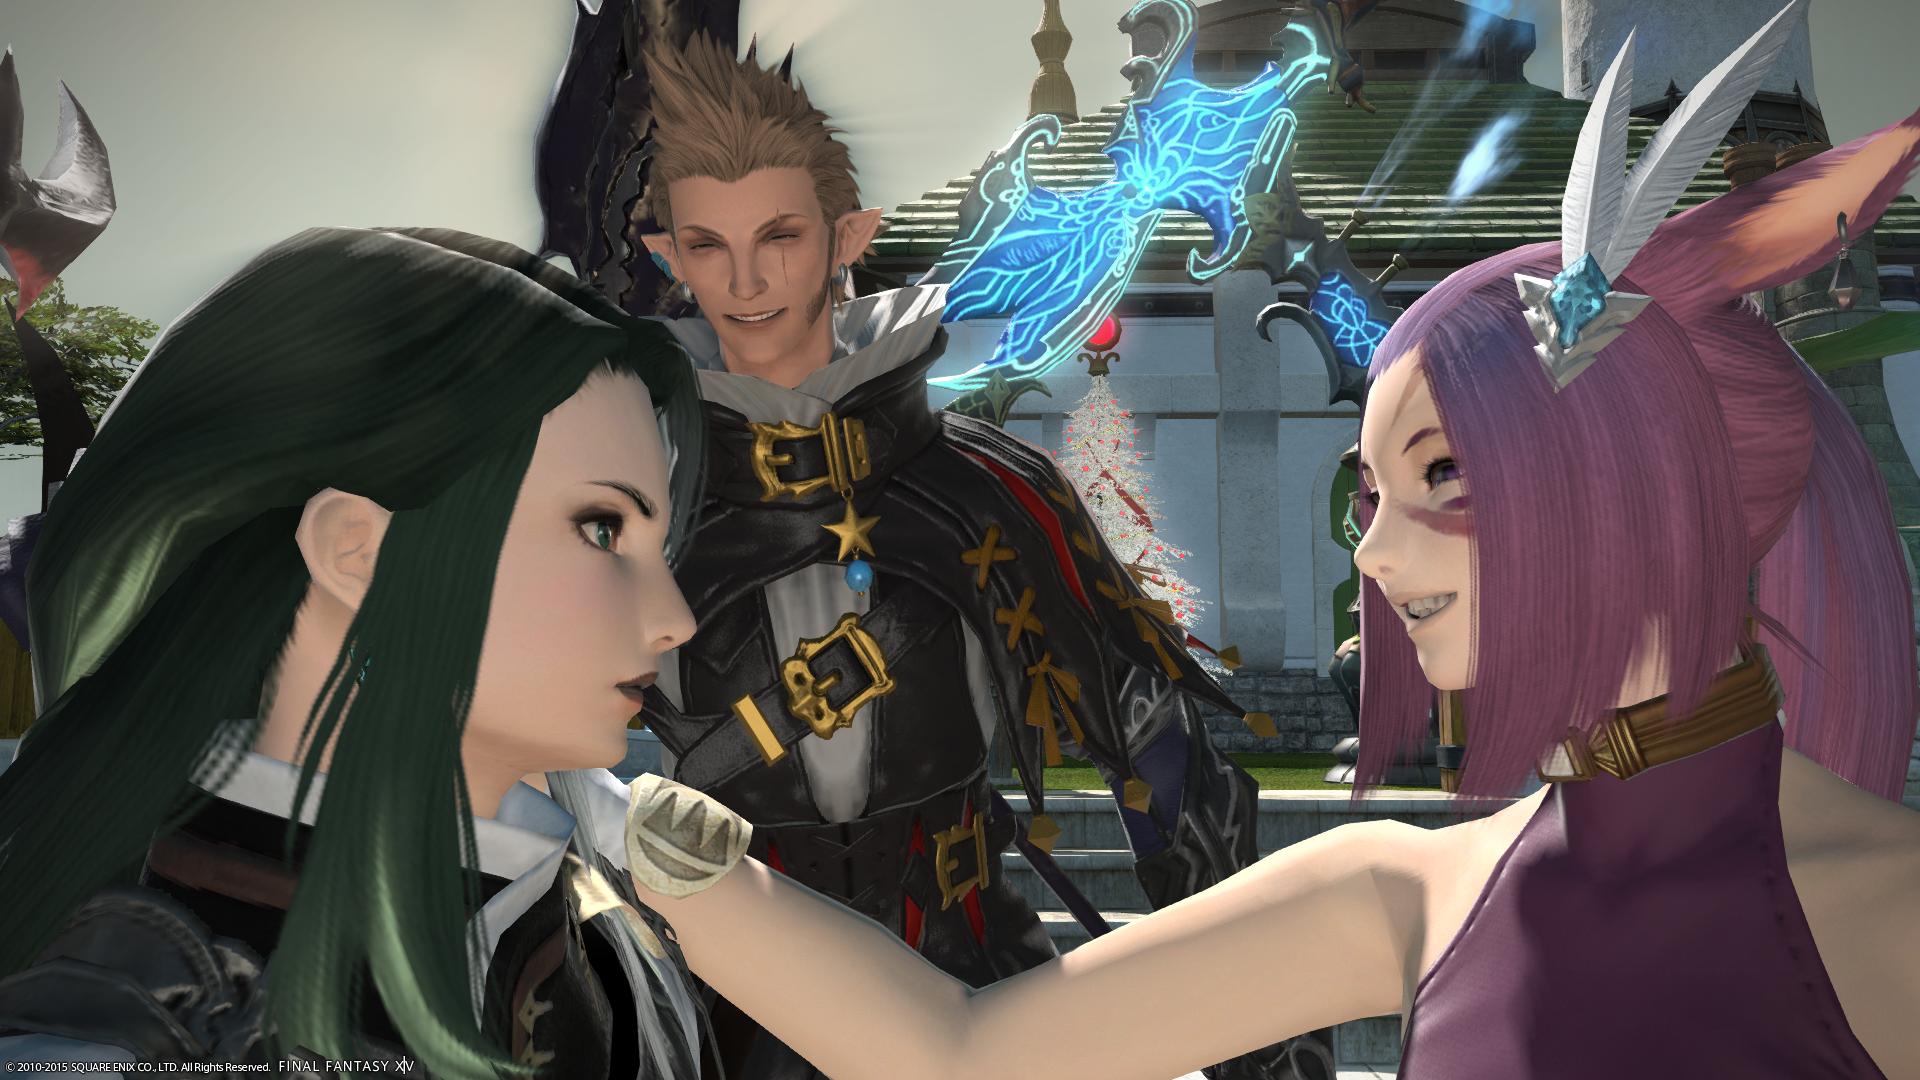 Final Fantasy XIV Patch 3.1 Release Date